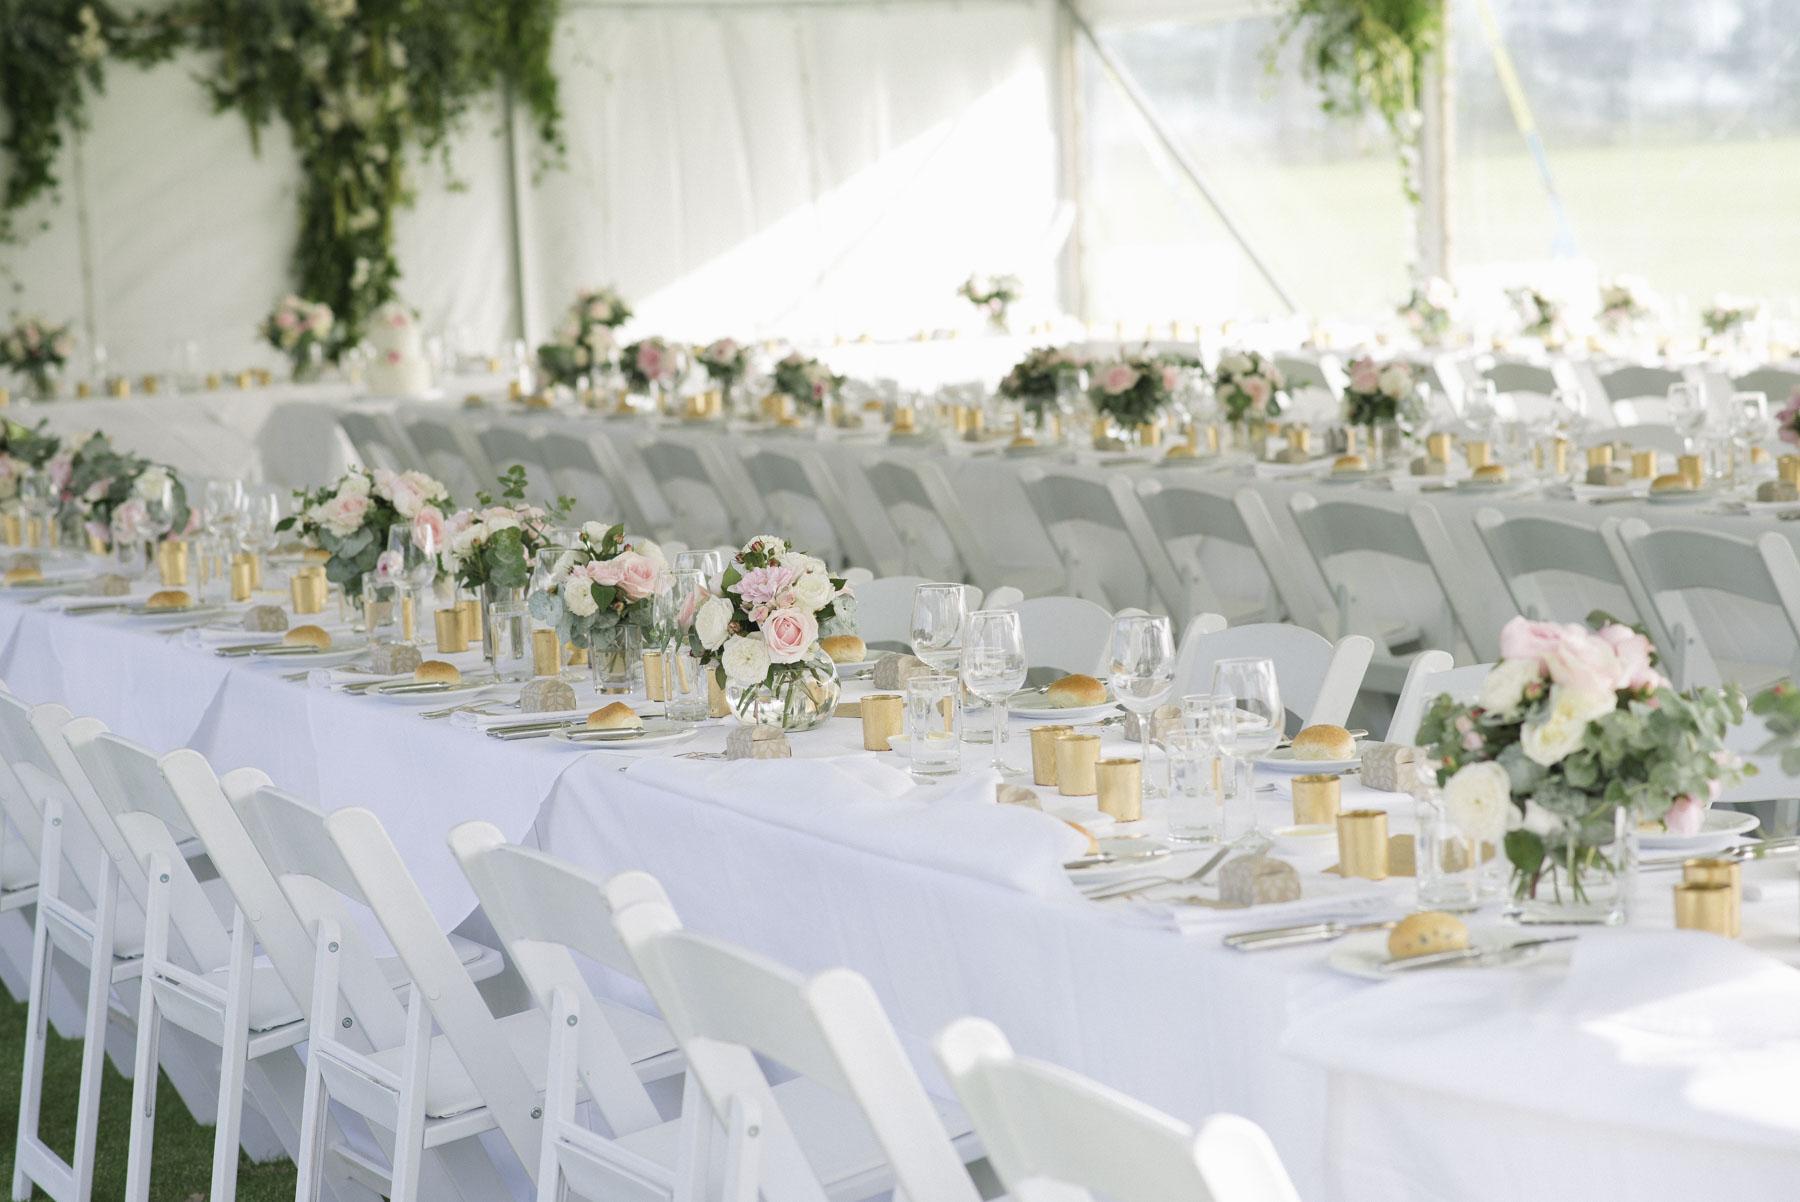 1501vand-270alan_moyle_wedding_portrait_brighton_bayside_werribee_estate_mansion_zoo_rustic_styled_garden_mansion_candid_documentry_victoria_whitelaw.jpg